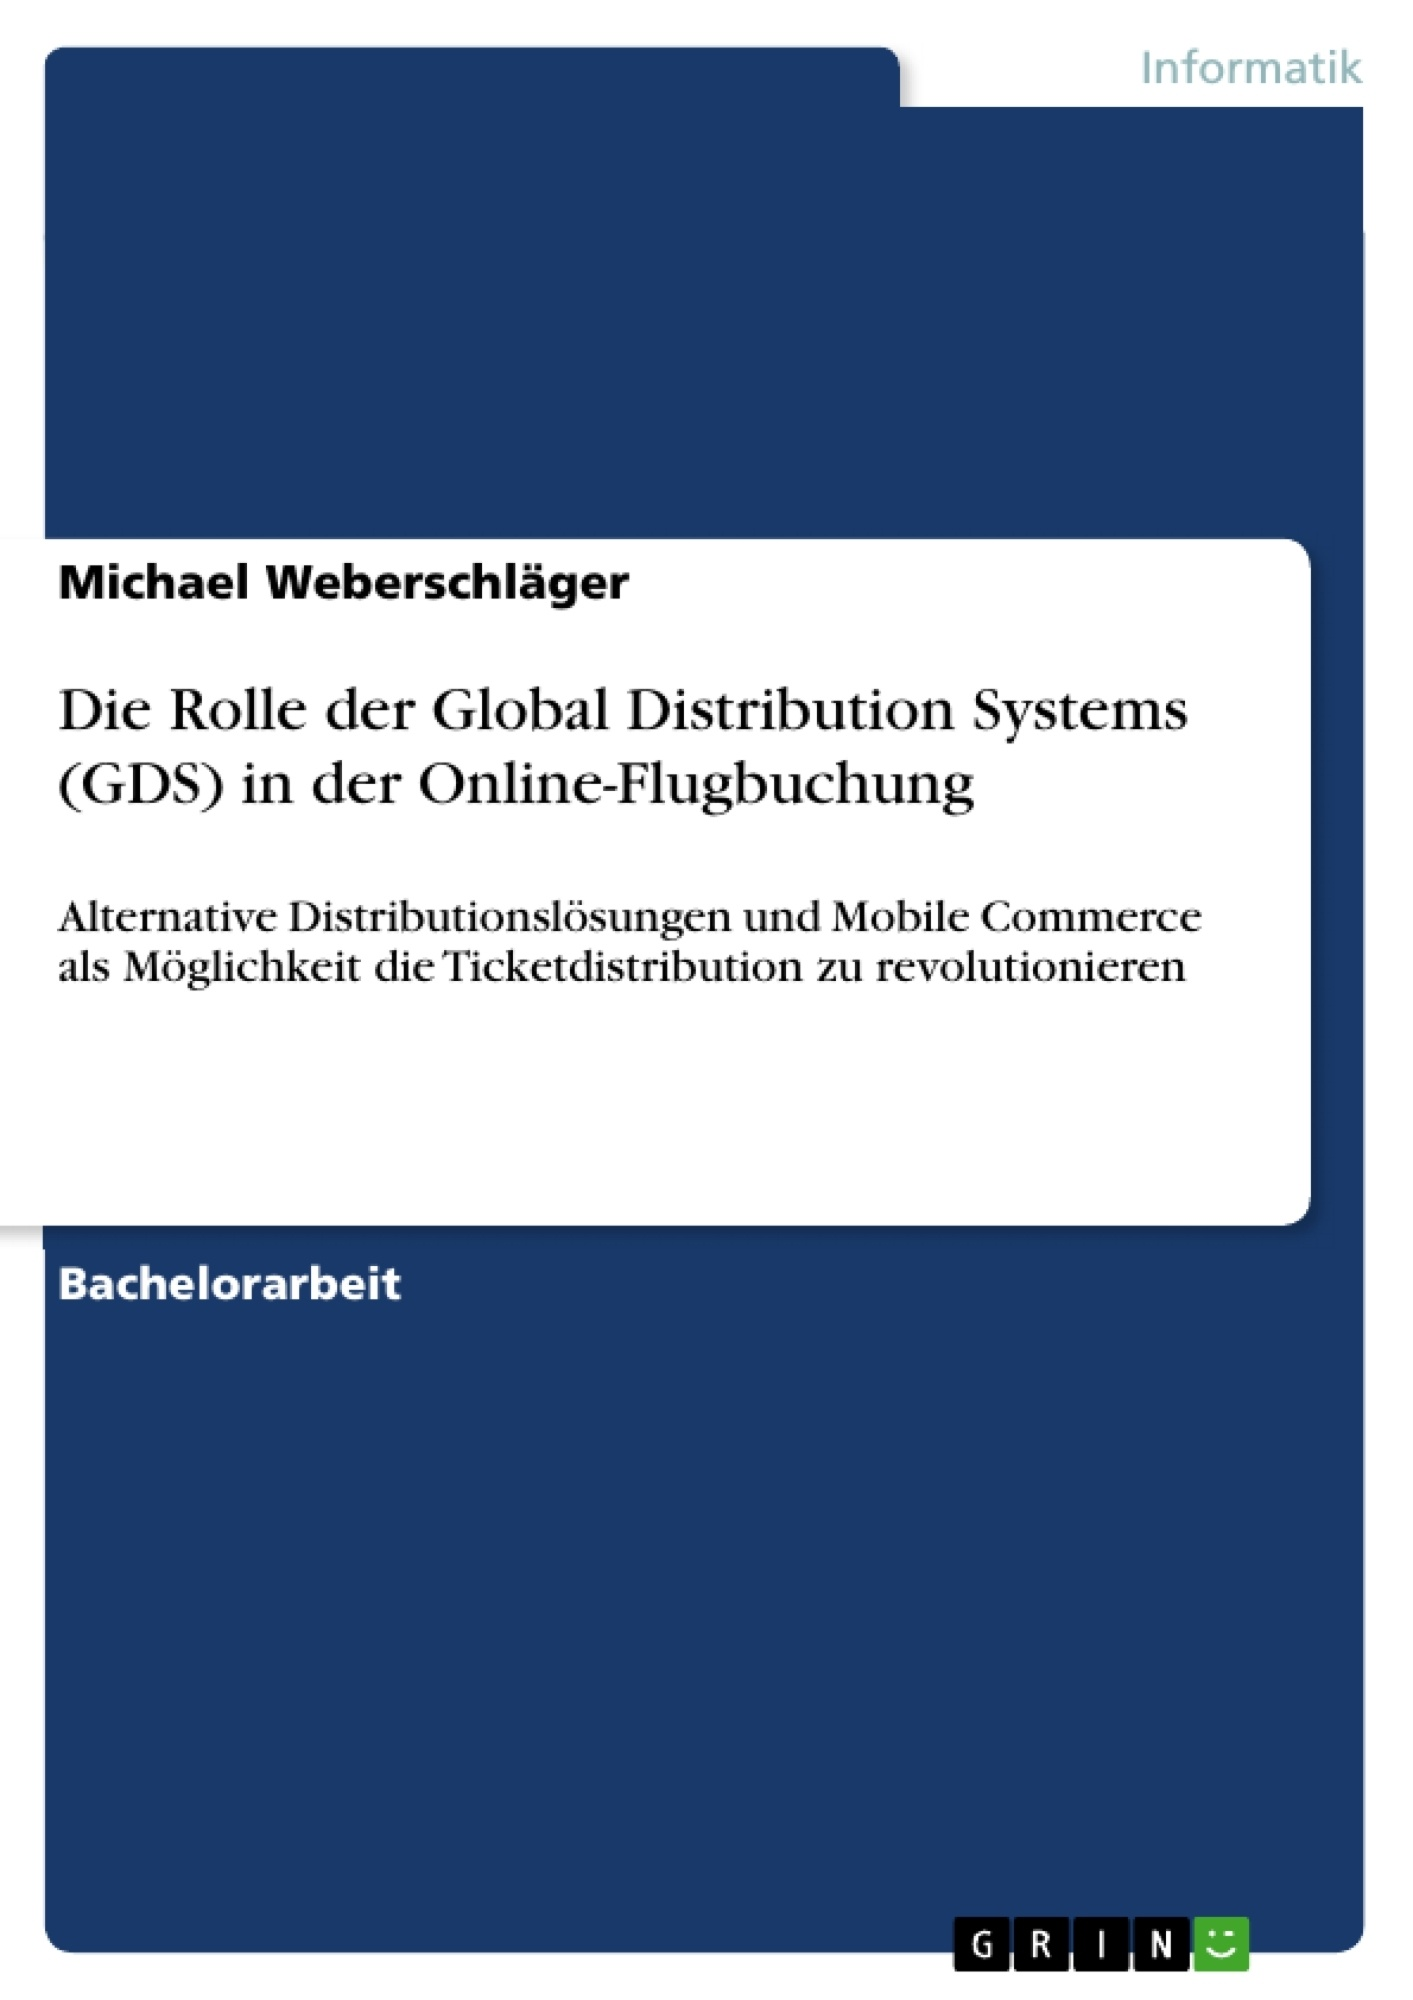 Titel: Die Rolle der Global Distribution Systems (GDS) in der Online-Flugbuchung